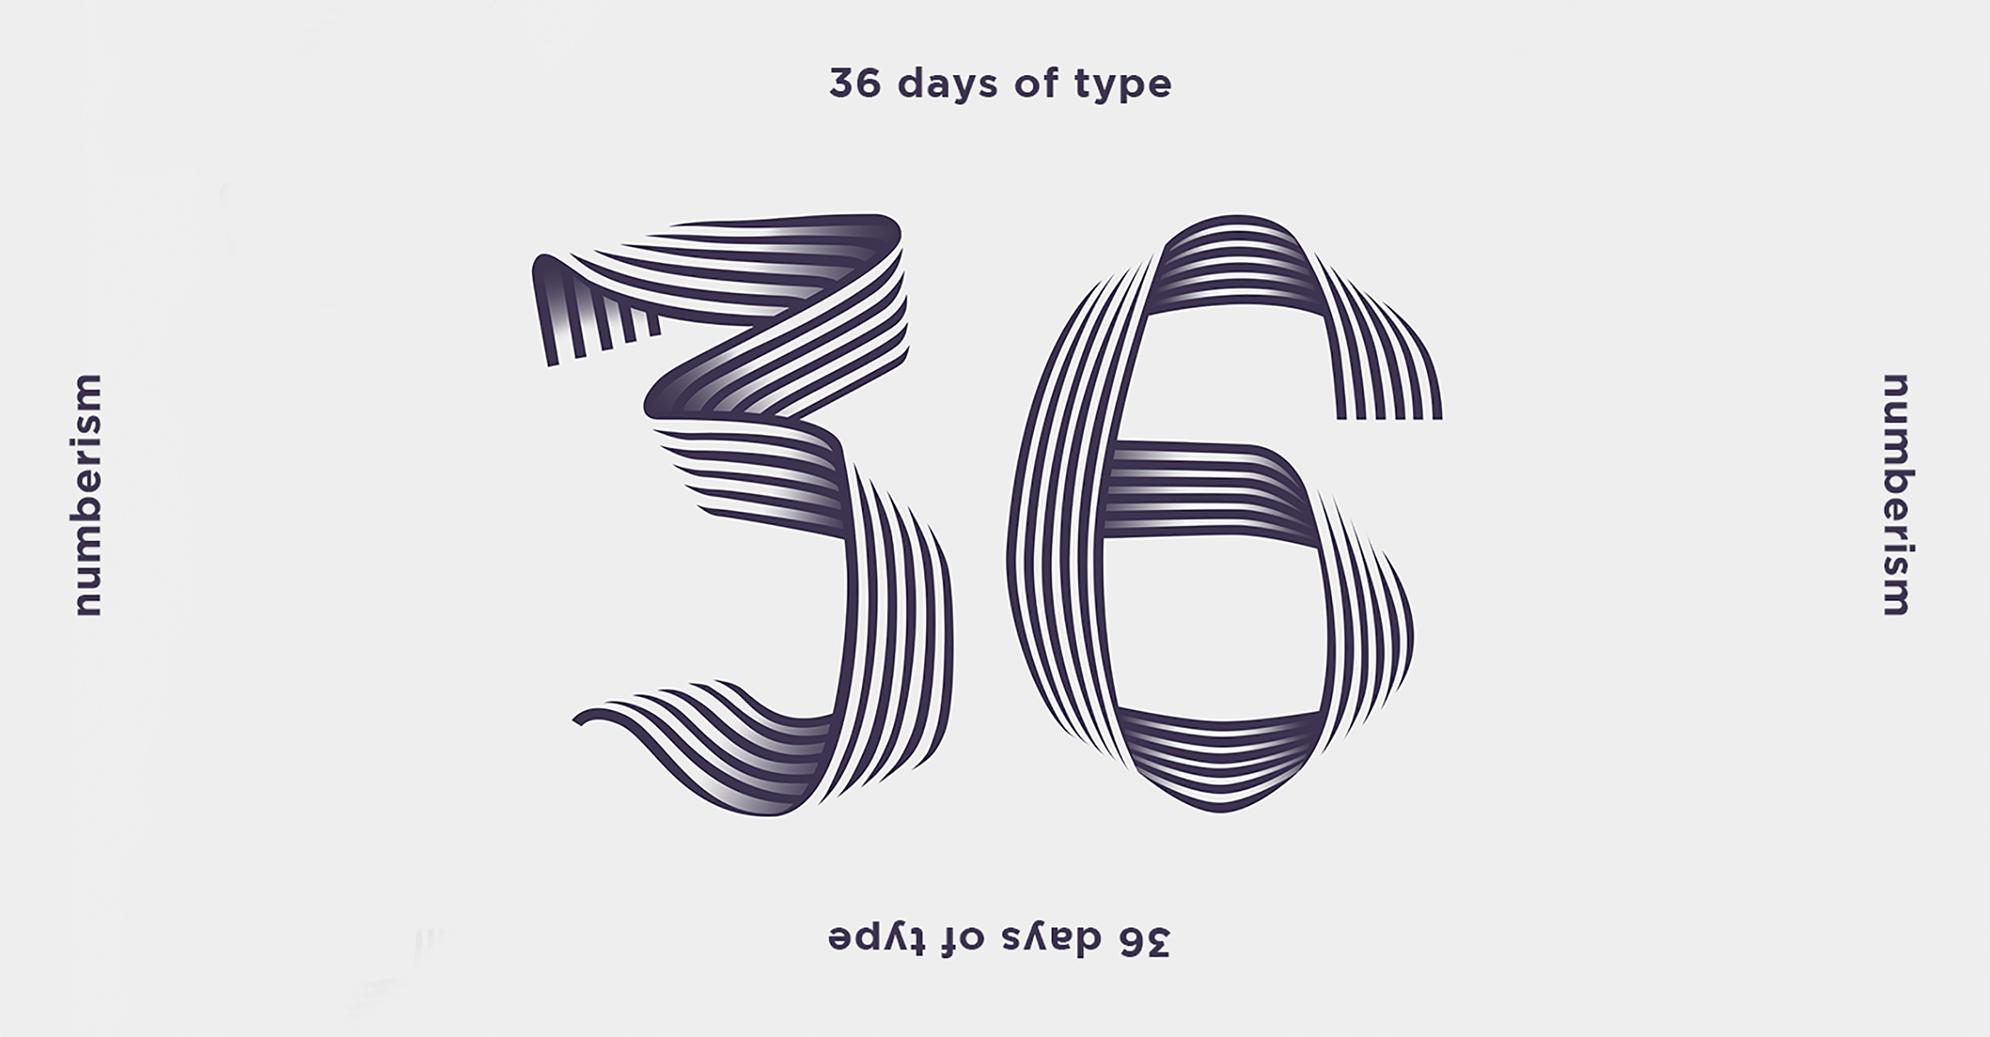 Numberism_36_Days_of_Type_Alvaro_Melgosa